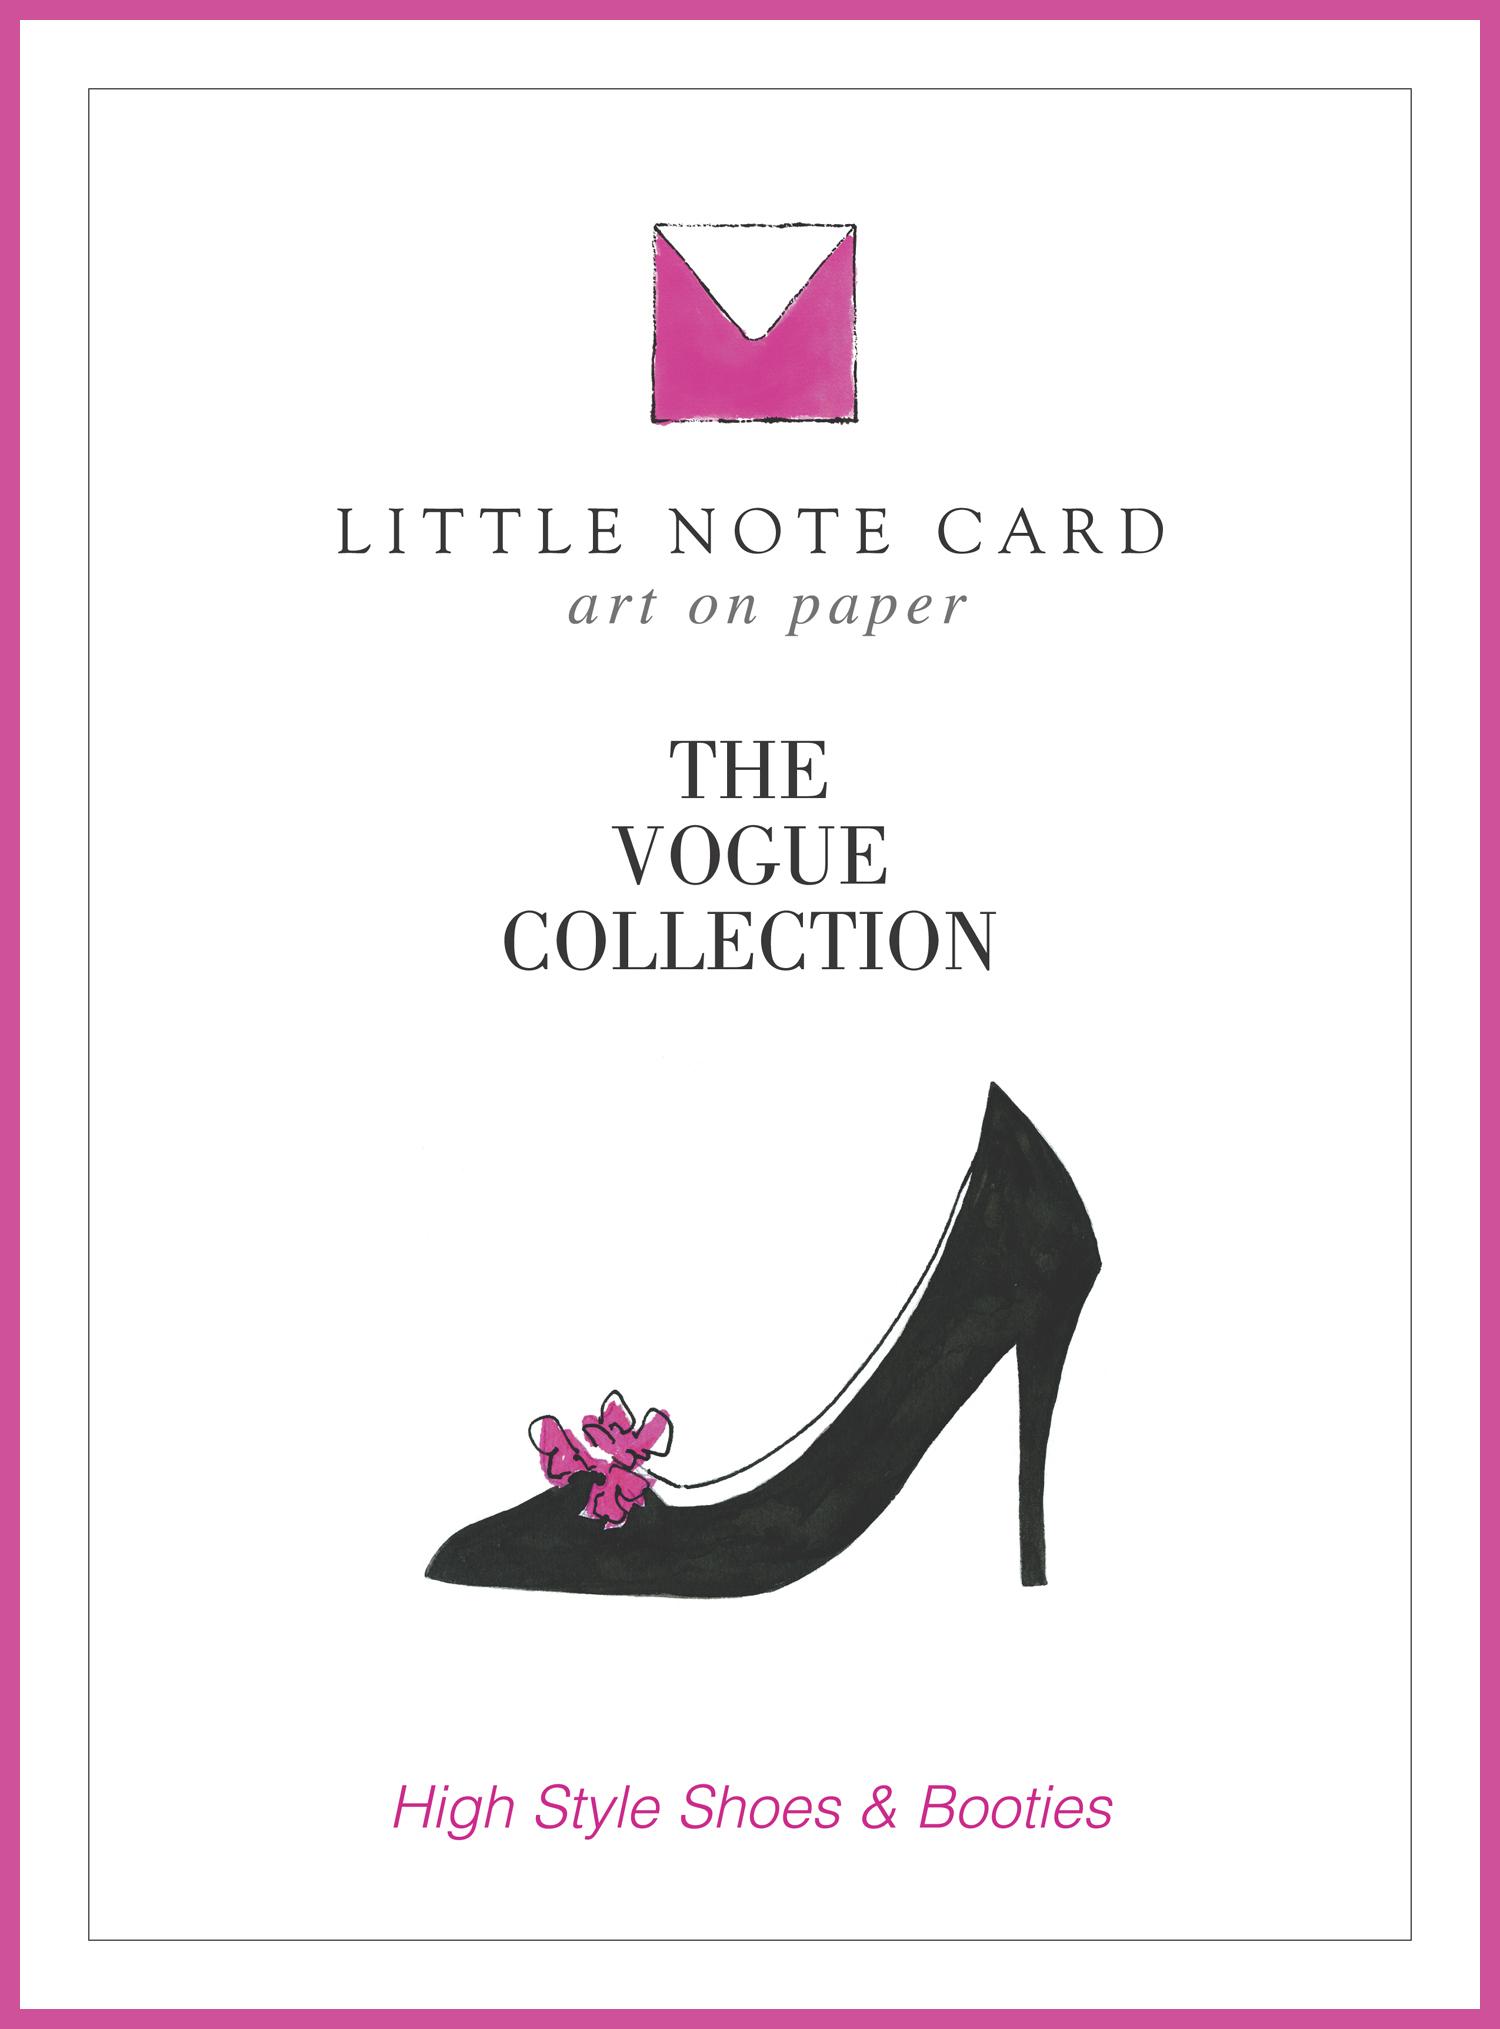 LittleNoteCard_VogueCollection_Signage